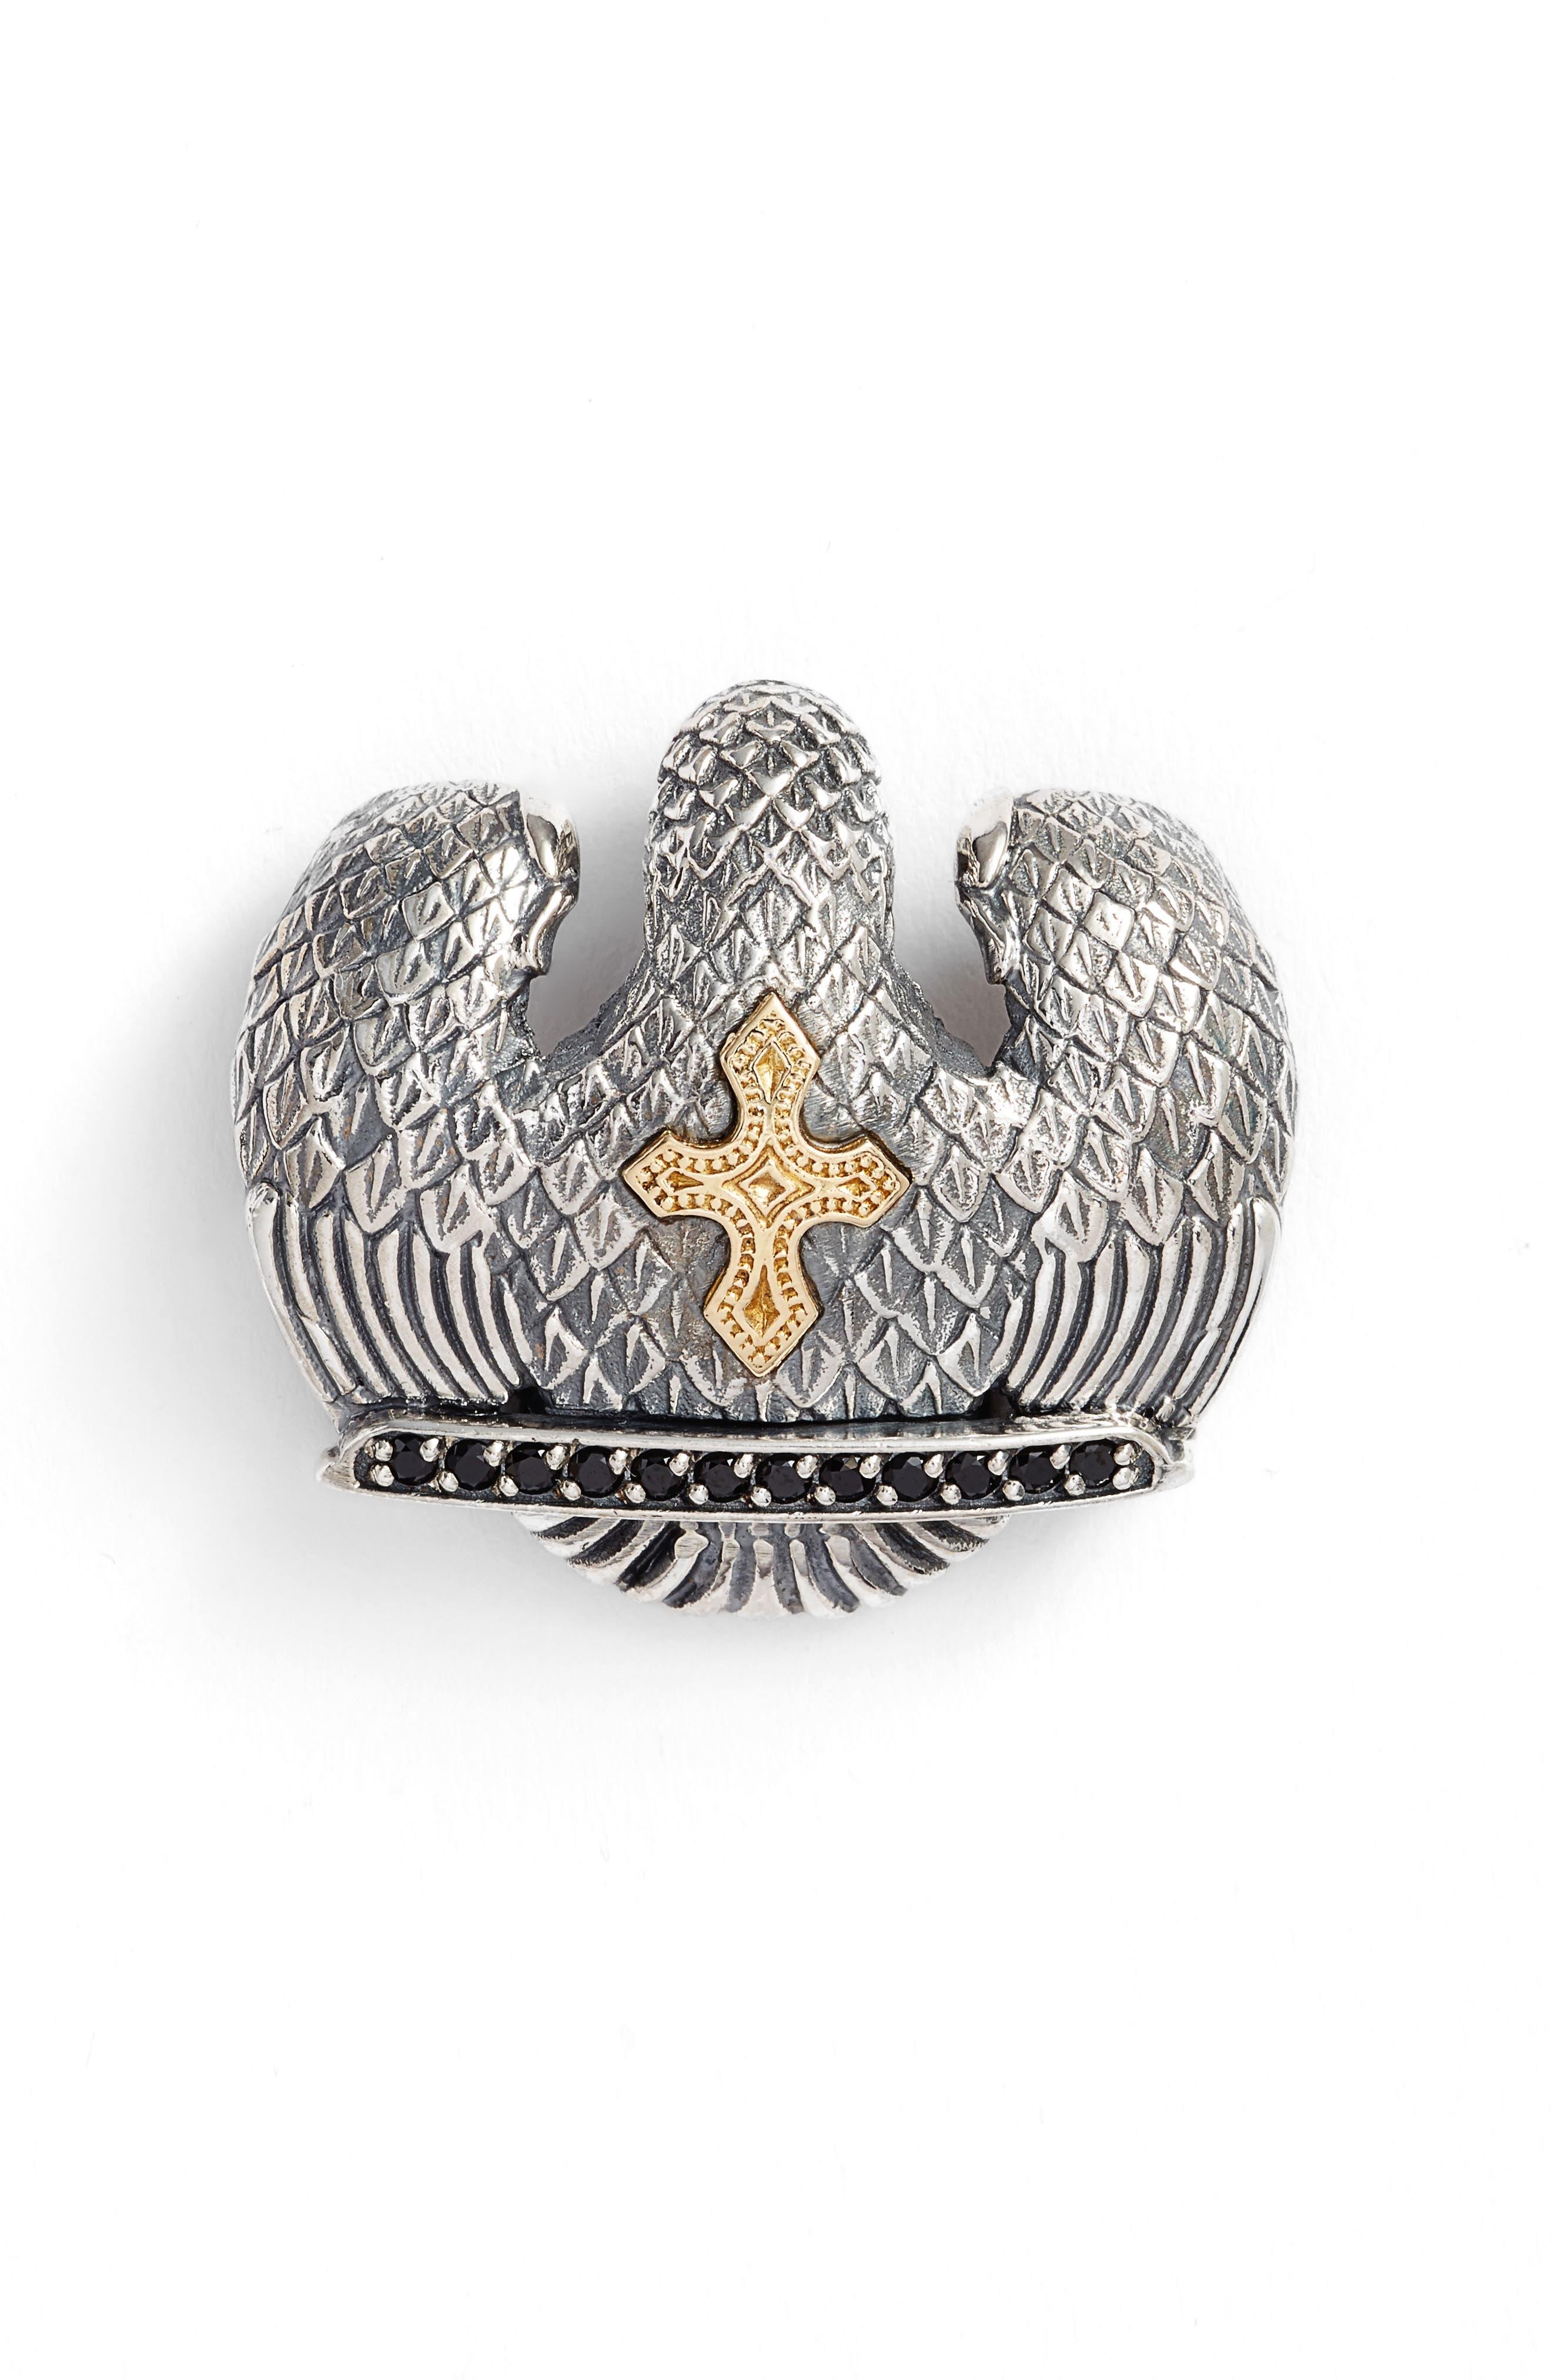 Heonos Two-Tone Eagle Pendant,                             Alternate thumbnail 2, color,                             Silver/ Gold